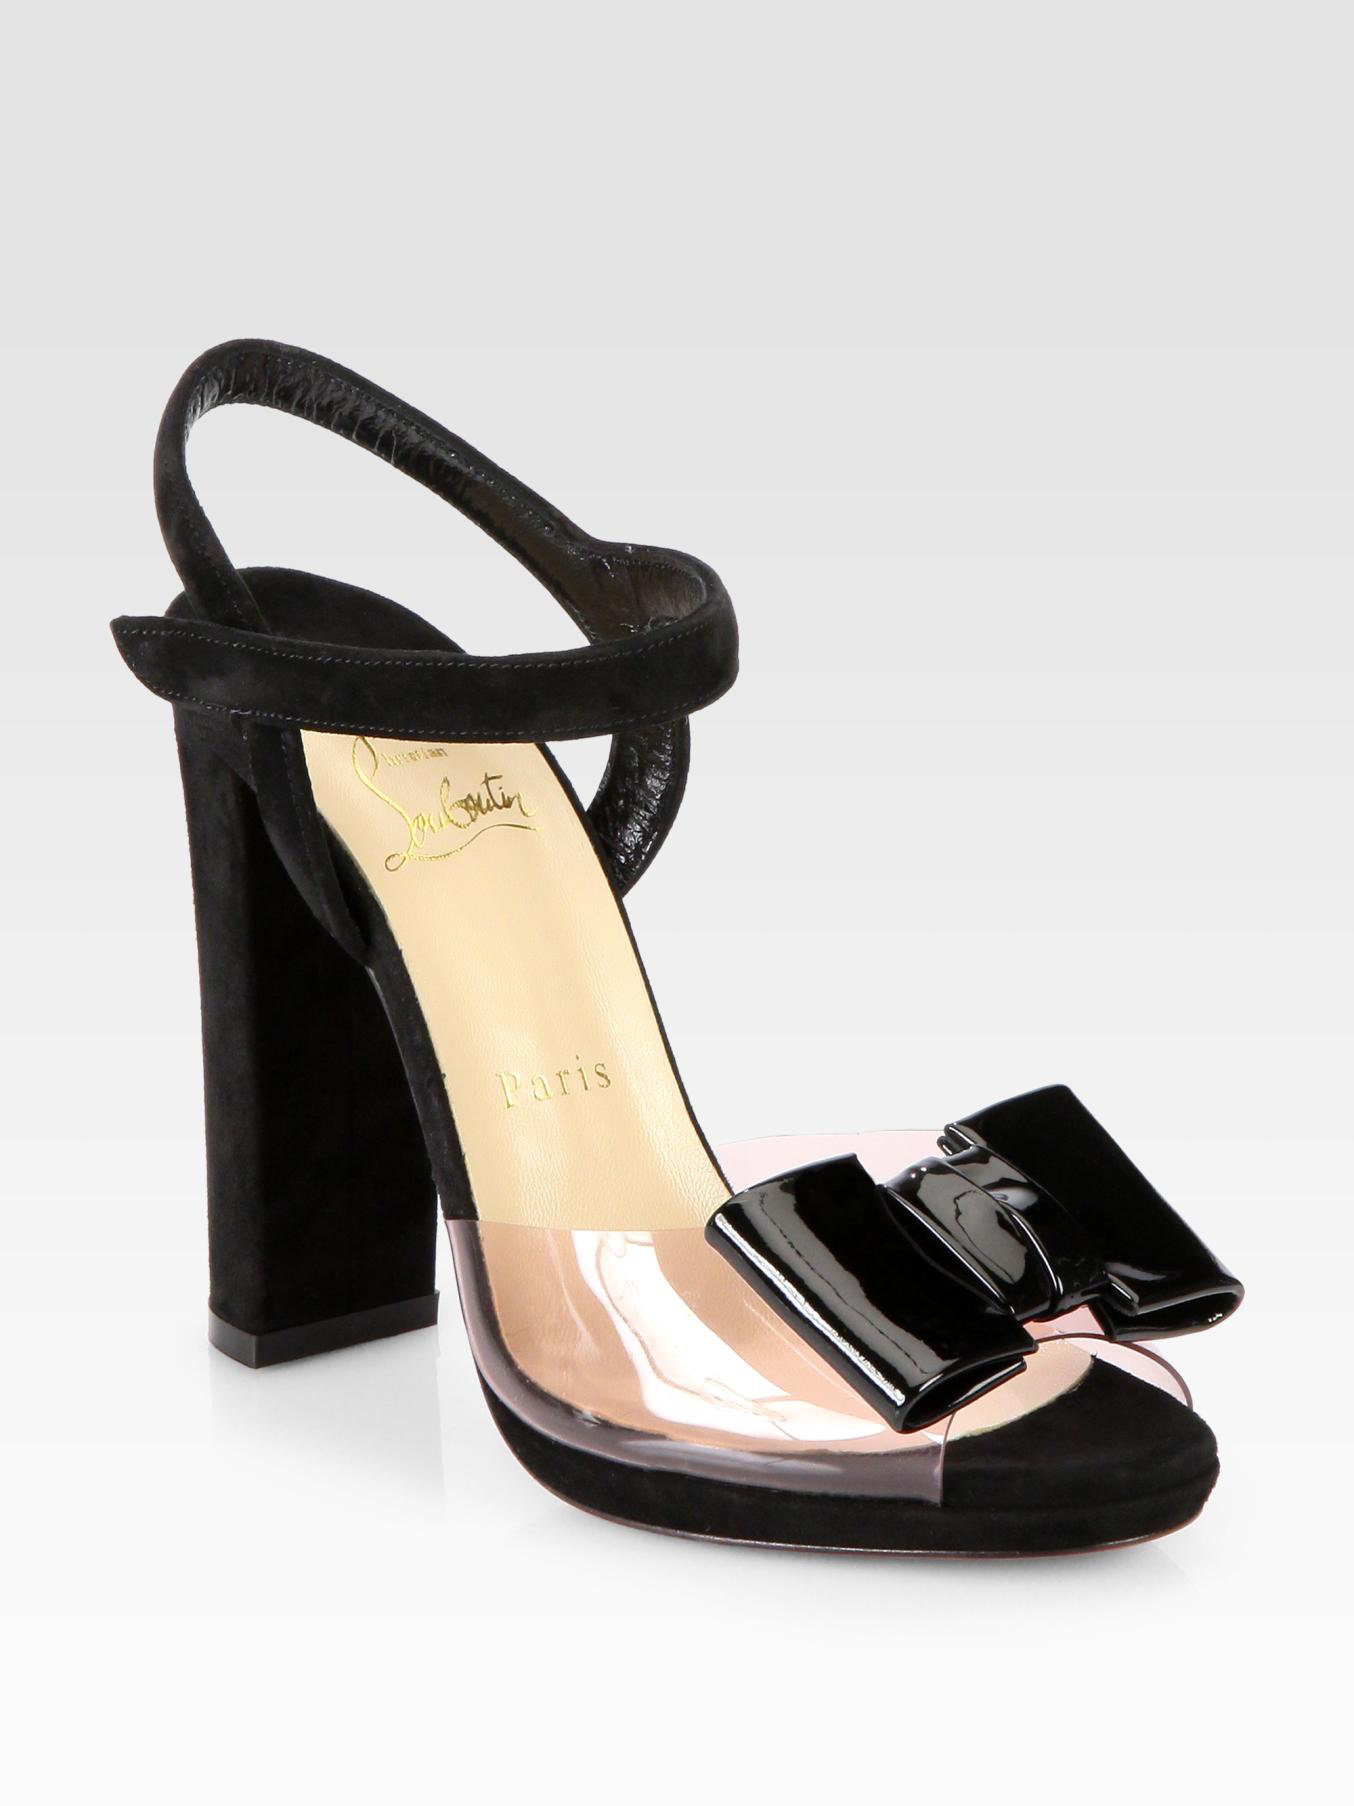 promo code e05de bb12e Christian Louboutin Black One Bow Suede Patent Leather Sandals